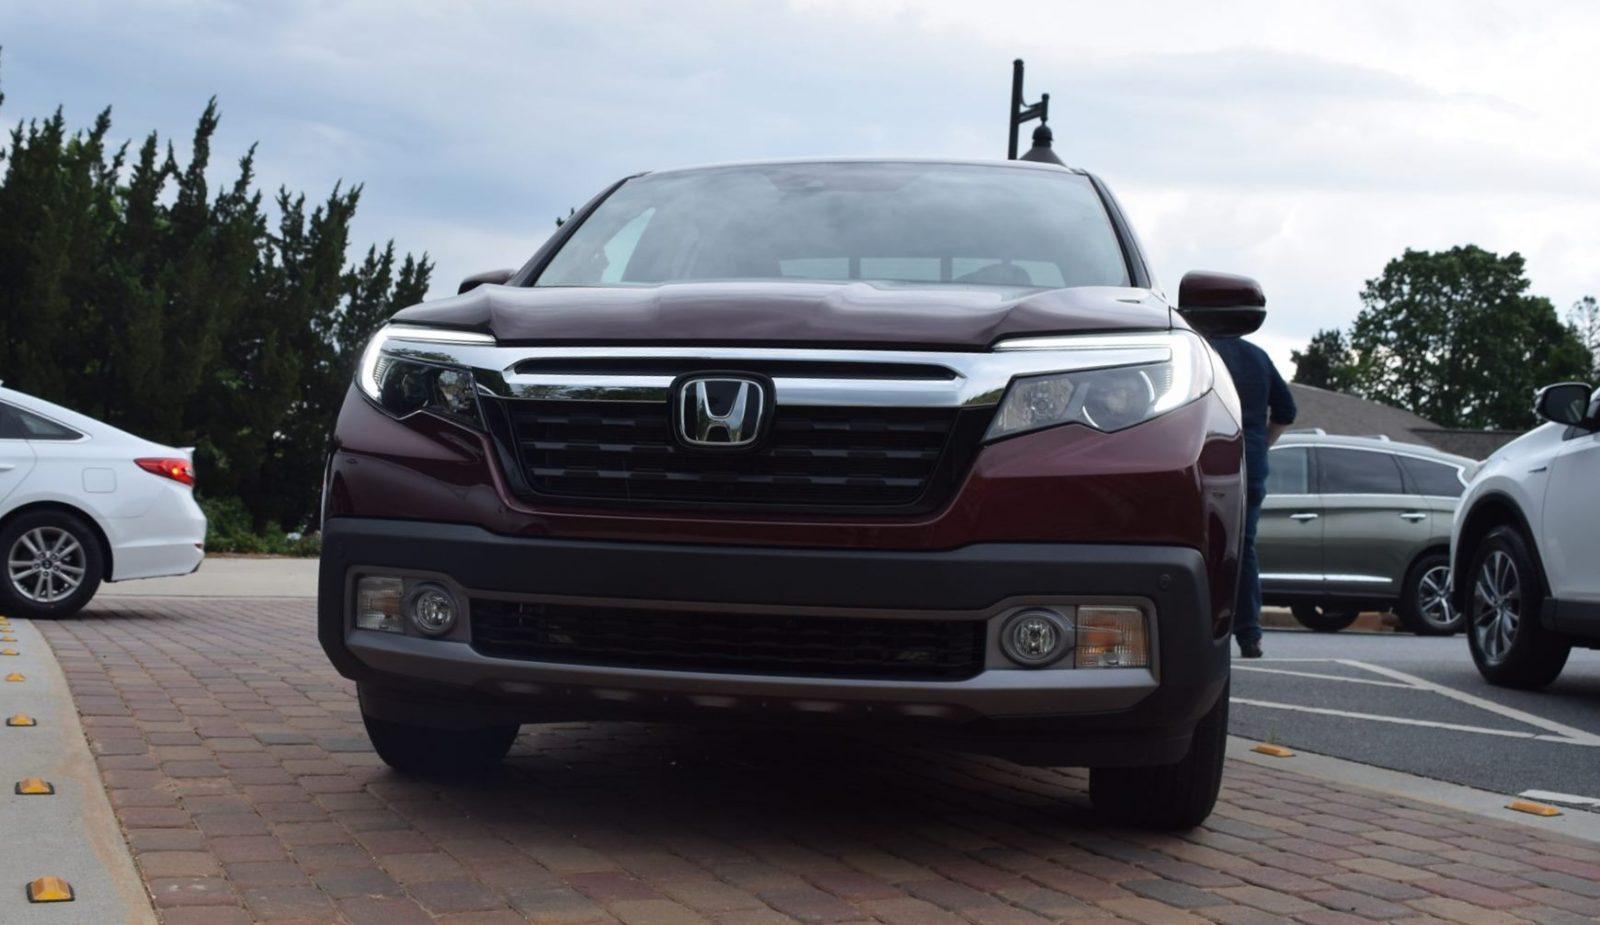 2017 Honda RIDGELINE RTL-E - SpeakerBed Stereo Intro and ...